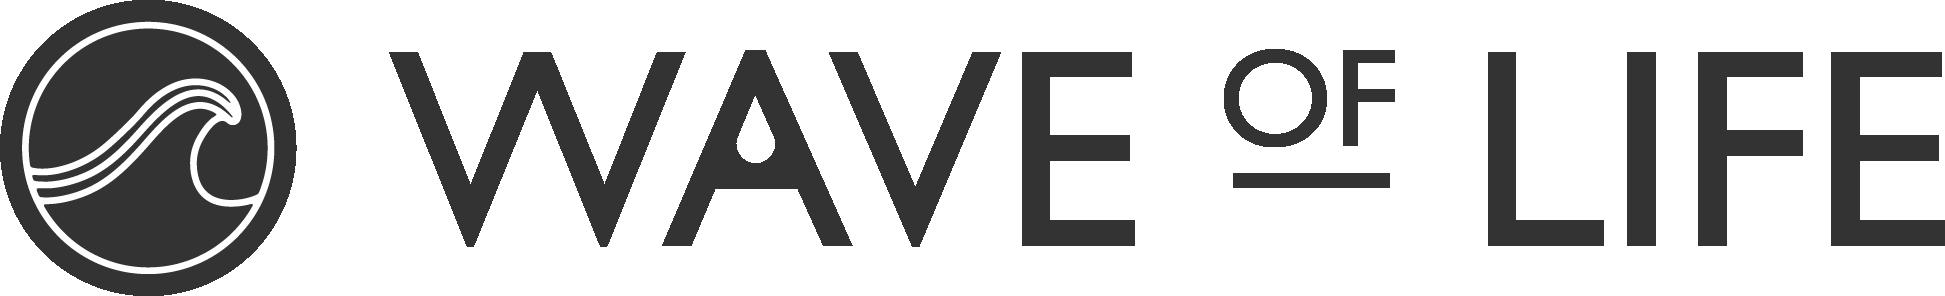 secondary-logo-blk.png